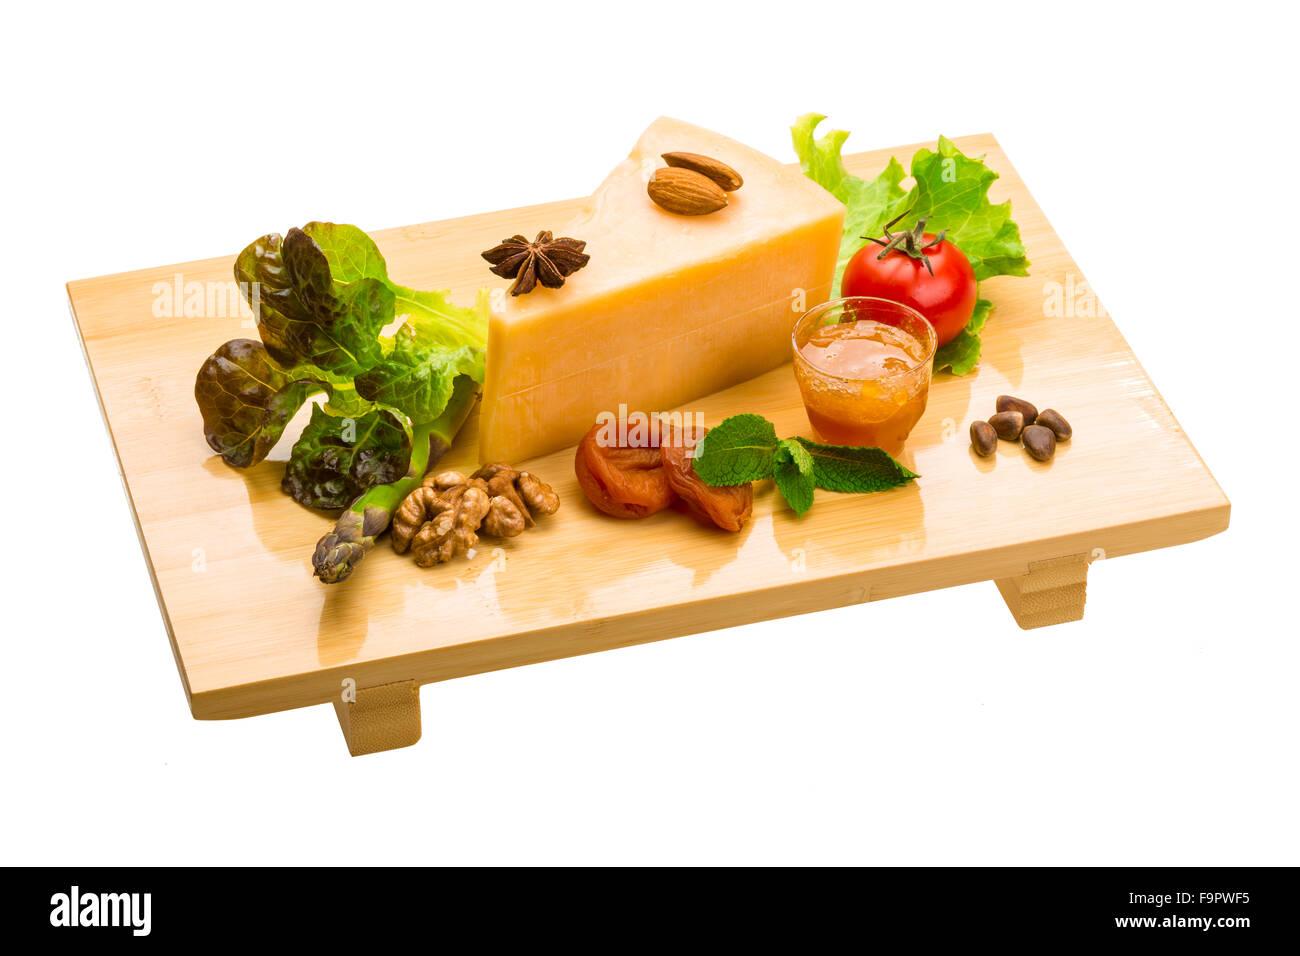 Old Hard Cheese Stockfoto, Lizenzfreies Bild: 92086713